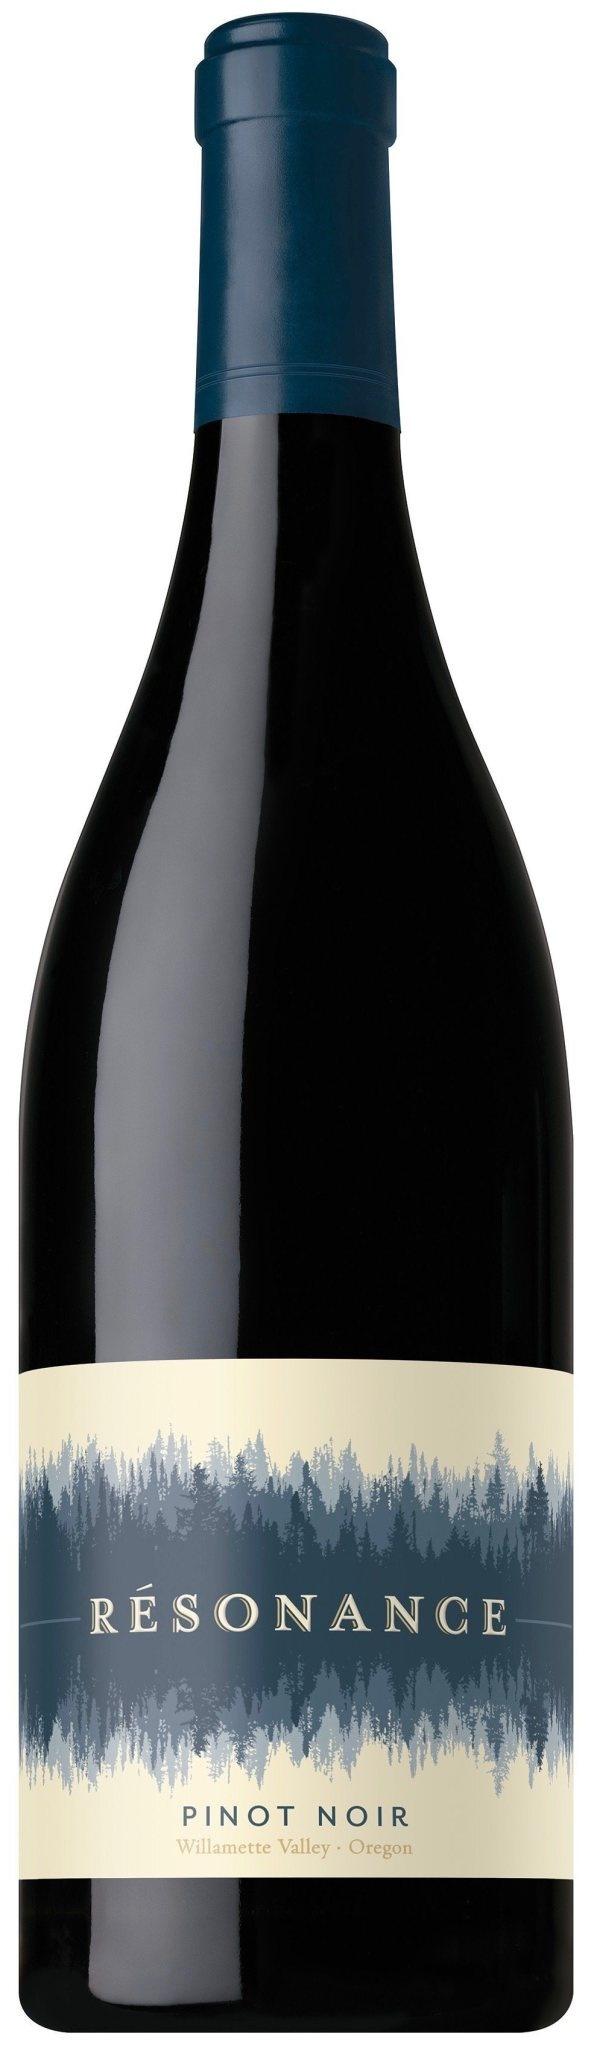 Resonance Willamette Valley Pinot Noir 2017 - 750ml